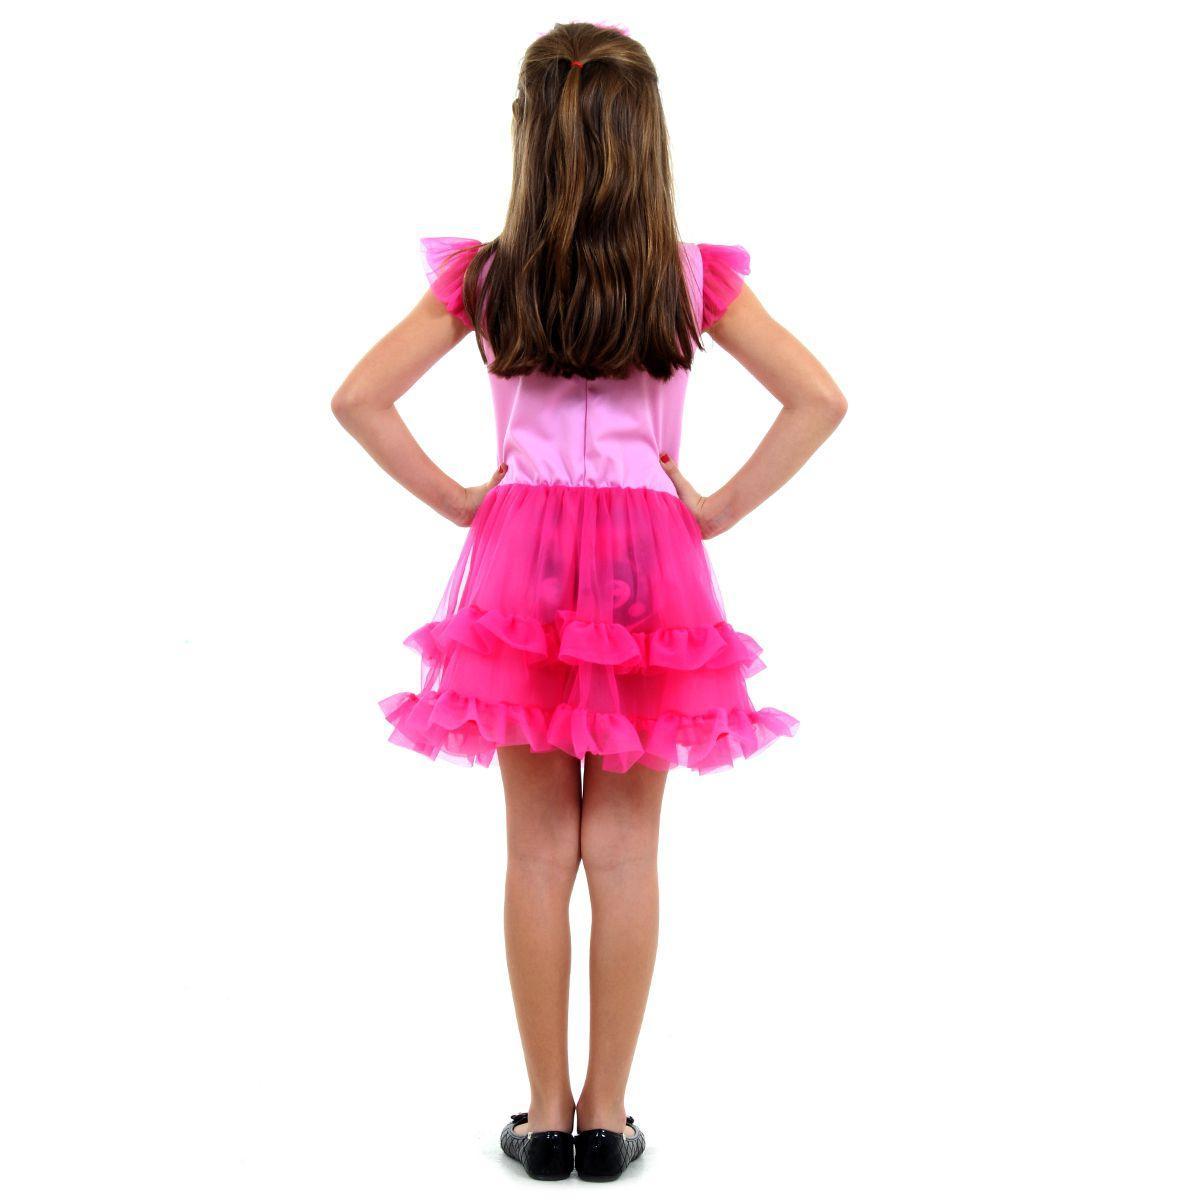 Fantasia Flamingo Infantil Faces Luxo Sula Arca De Noe Fantasias Para Criancas Magazine Luiza